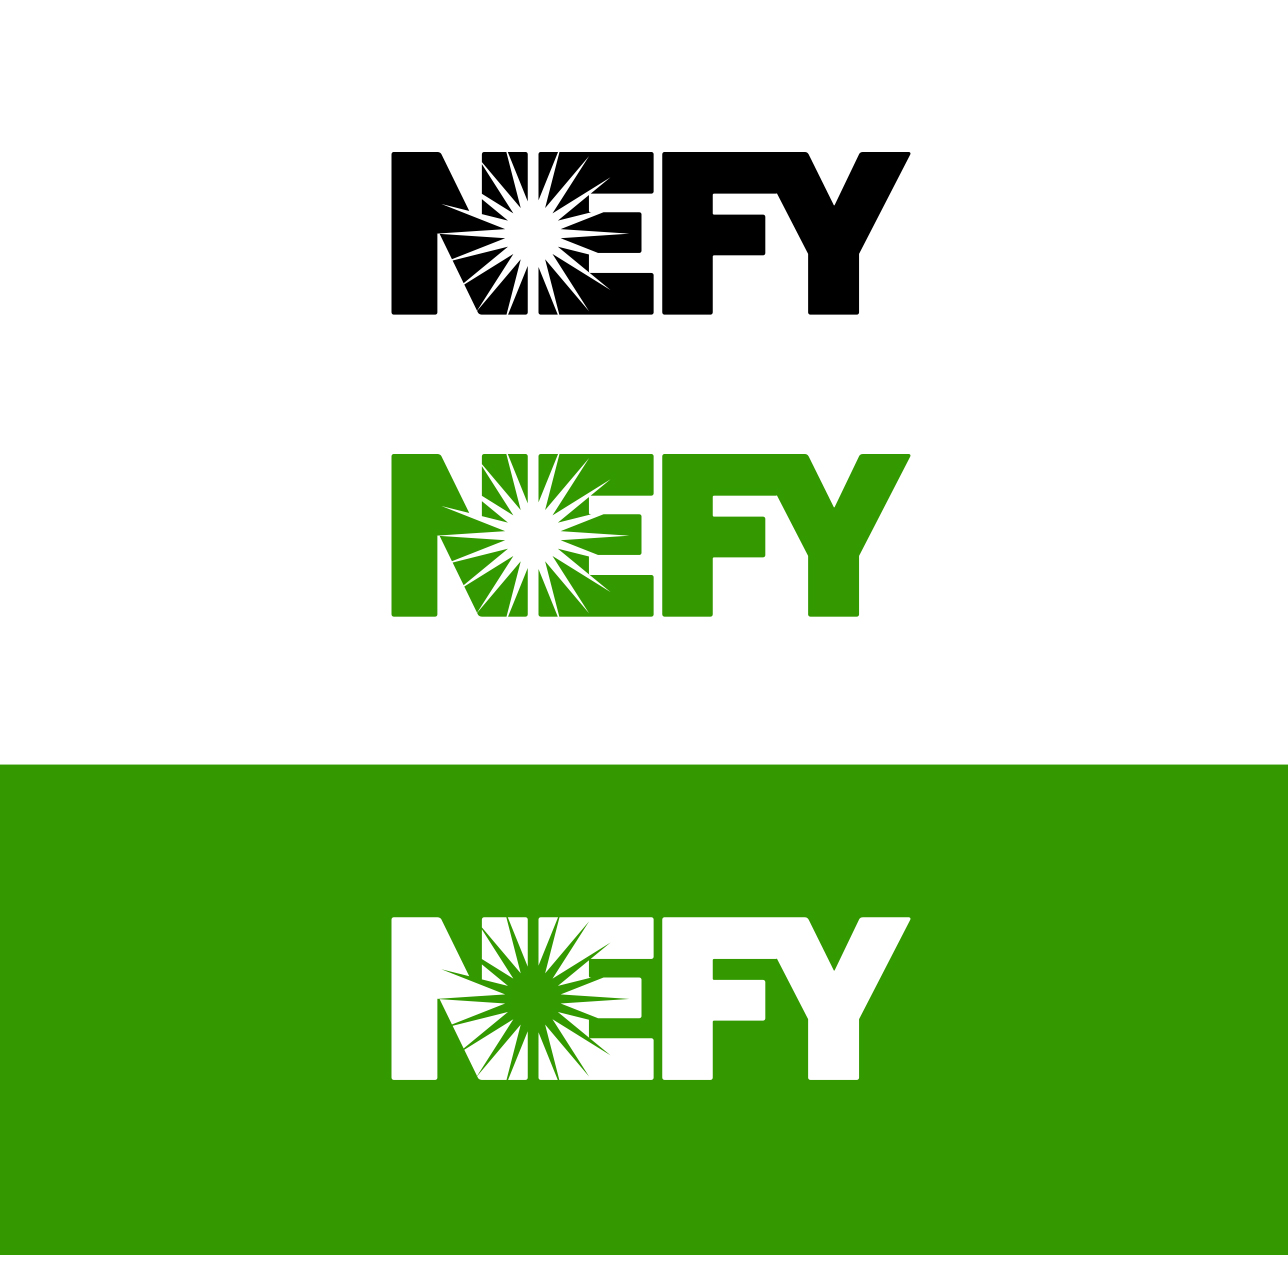 nefy-nutrition-logo-design1